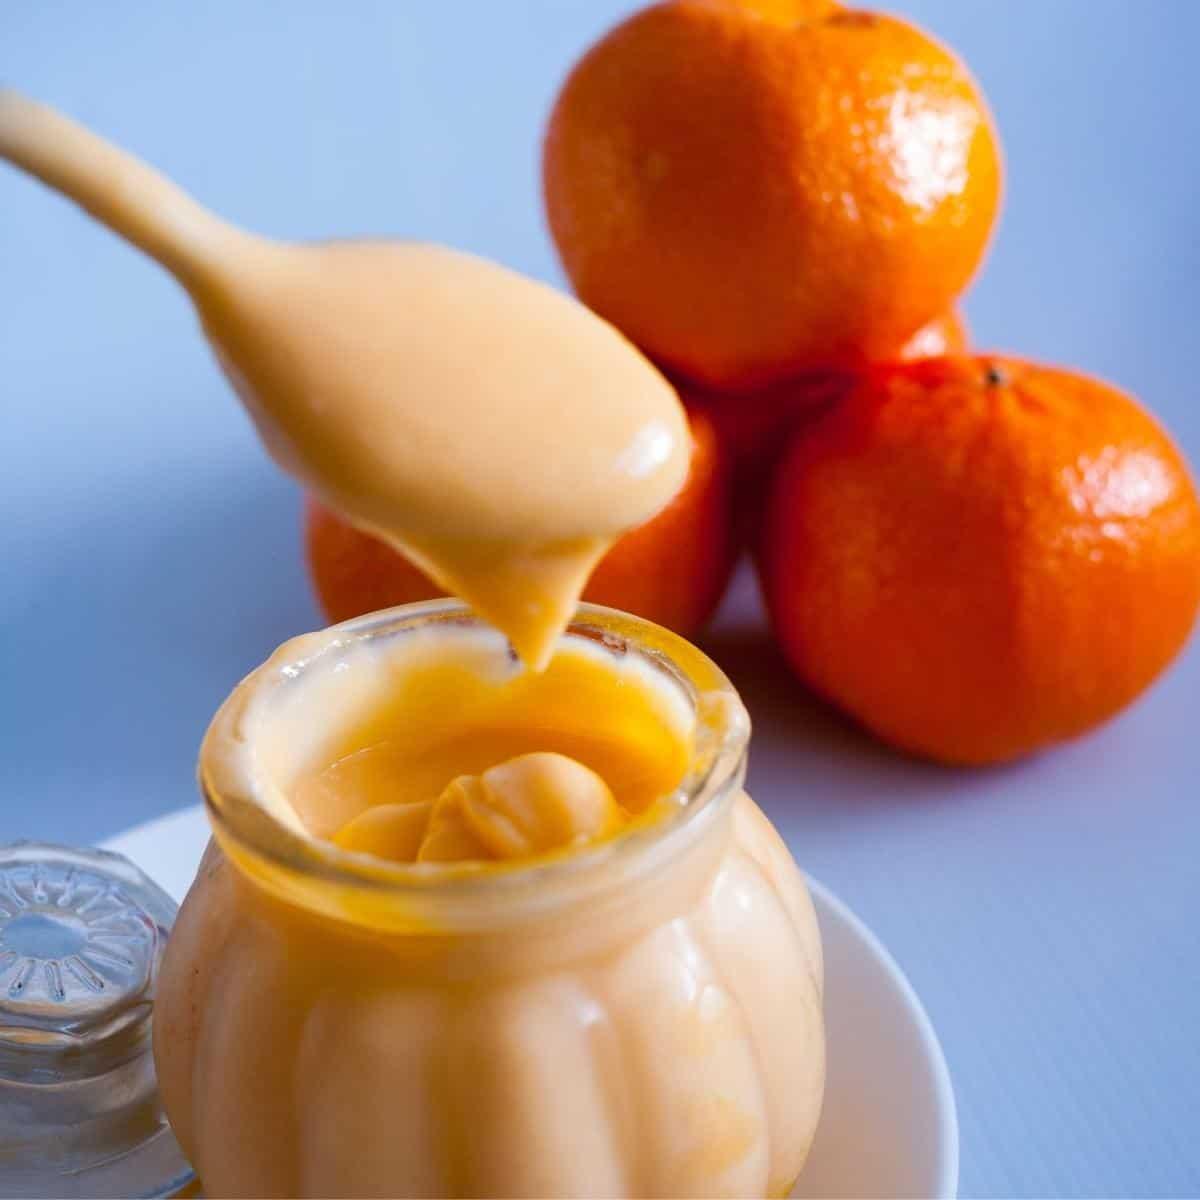 A jar with orange curd filling